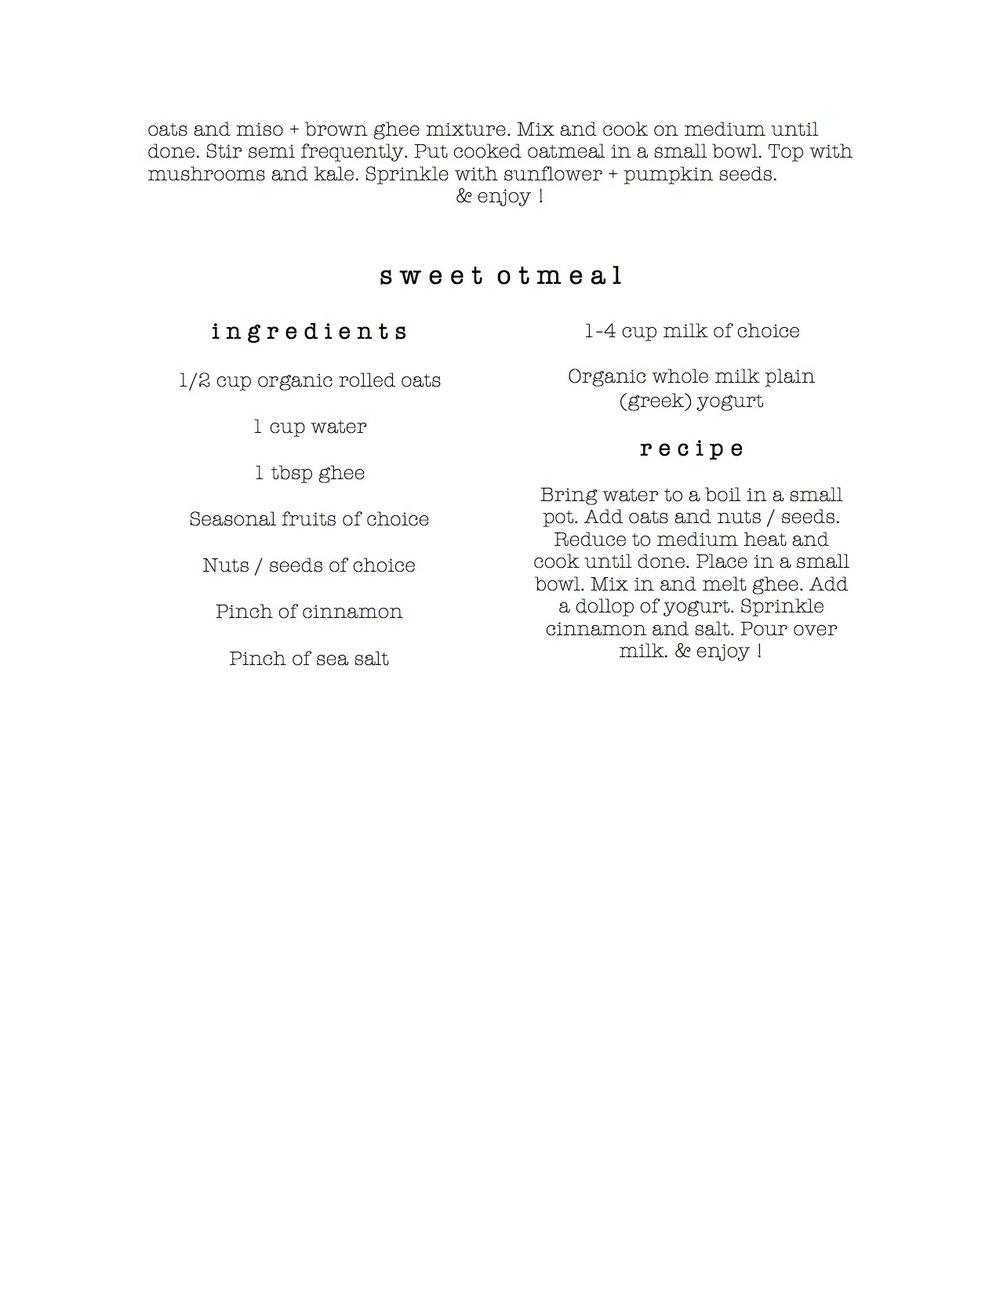 recipies autumn pg 7.jpg